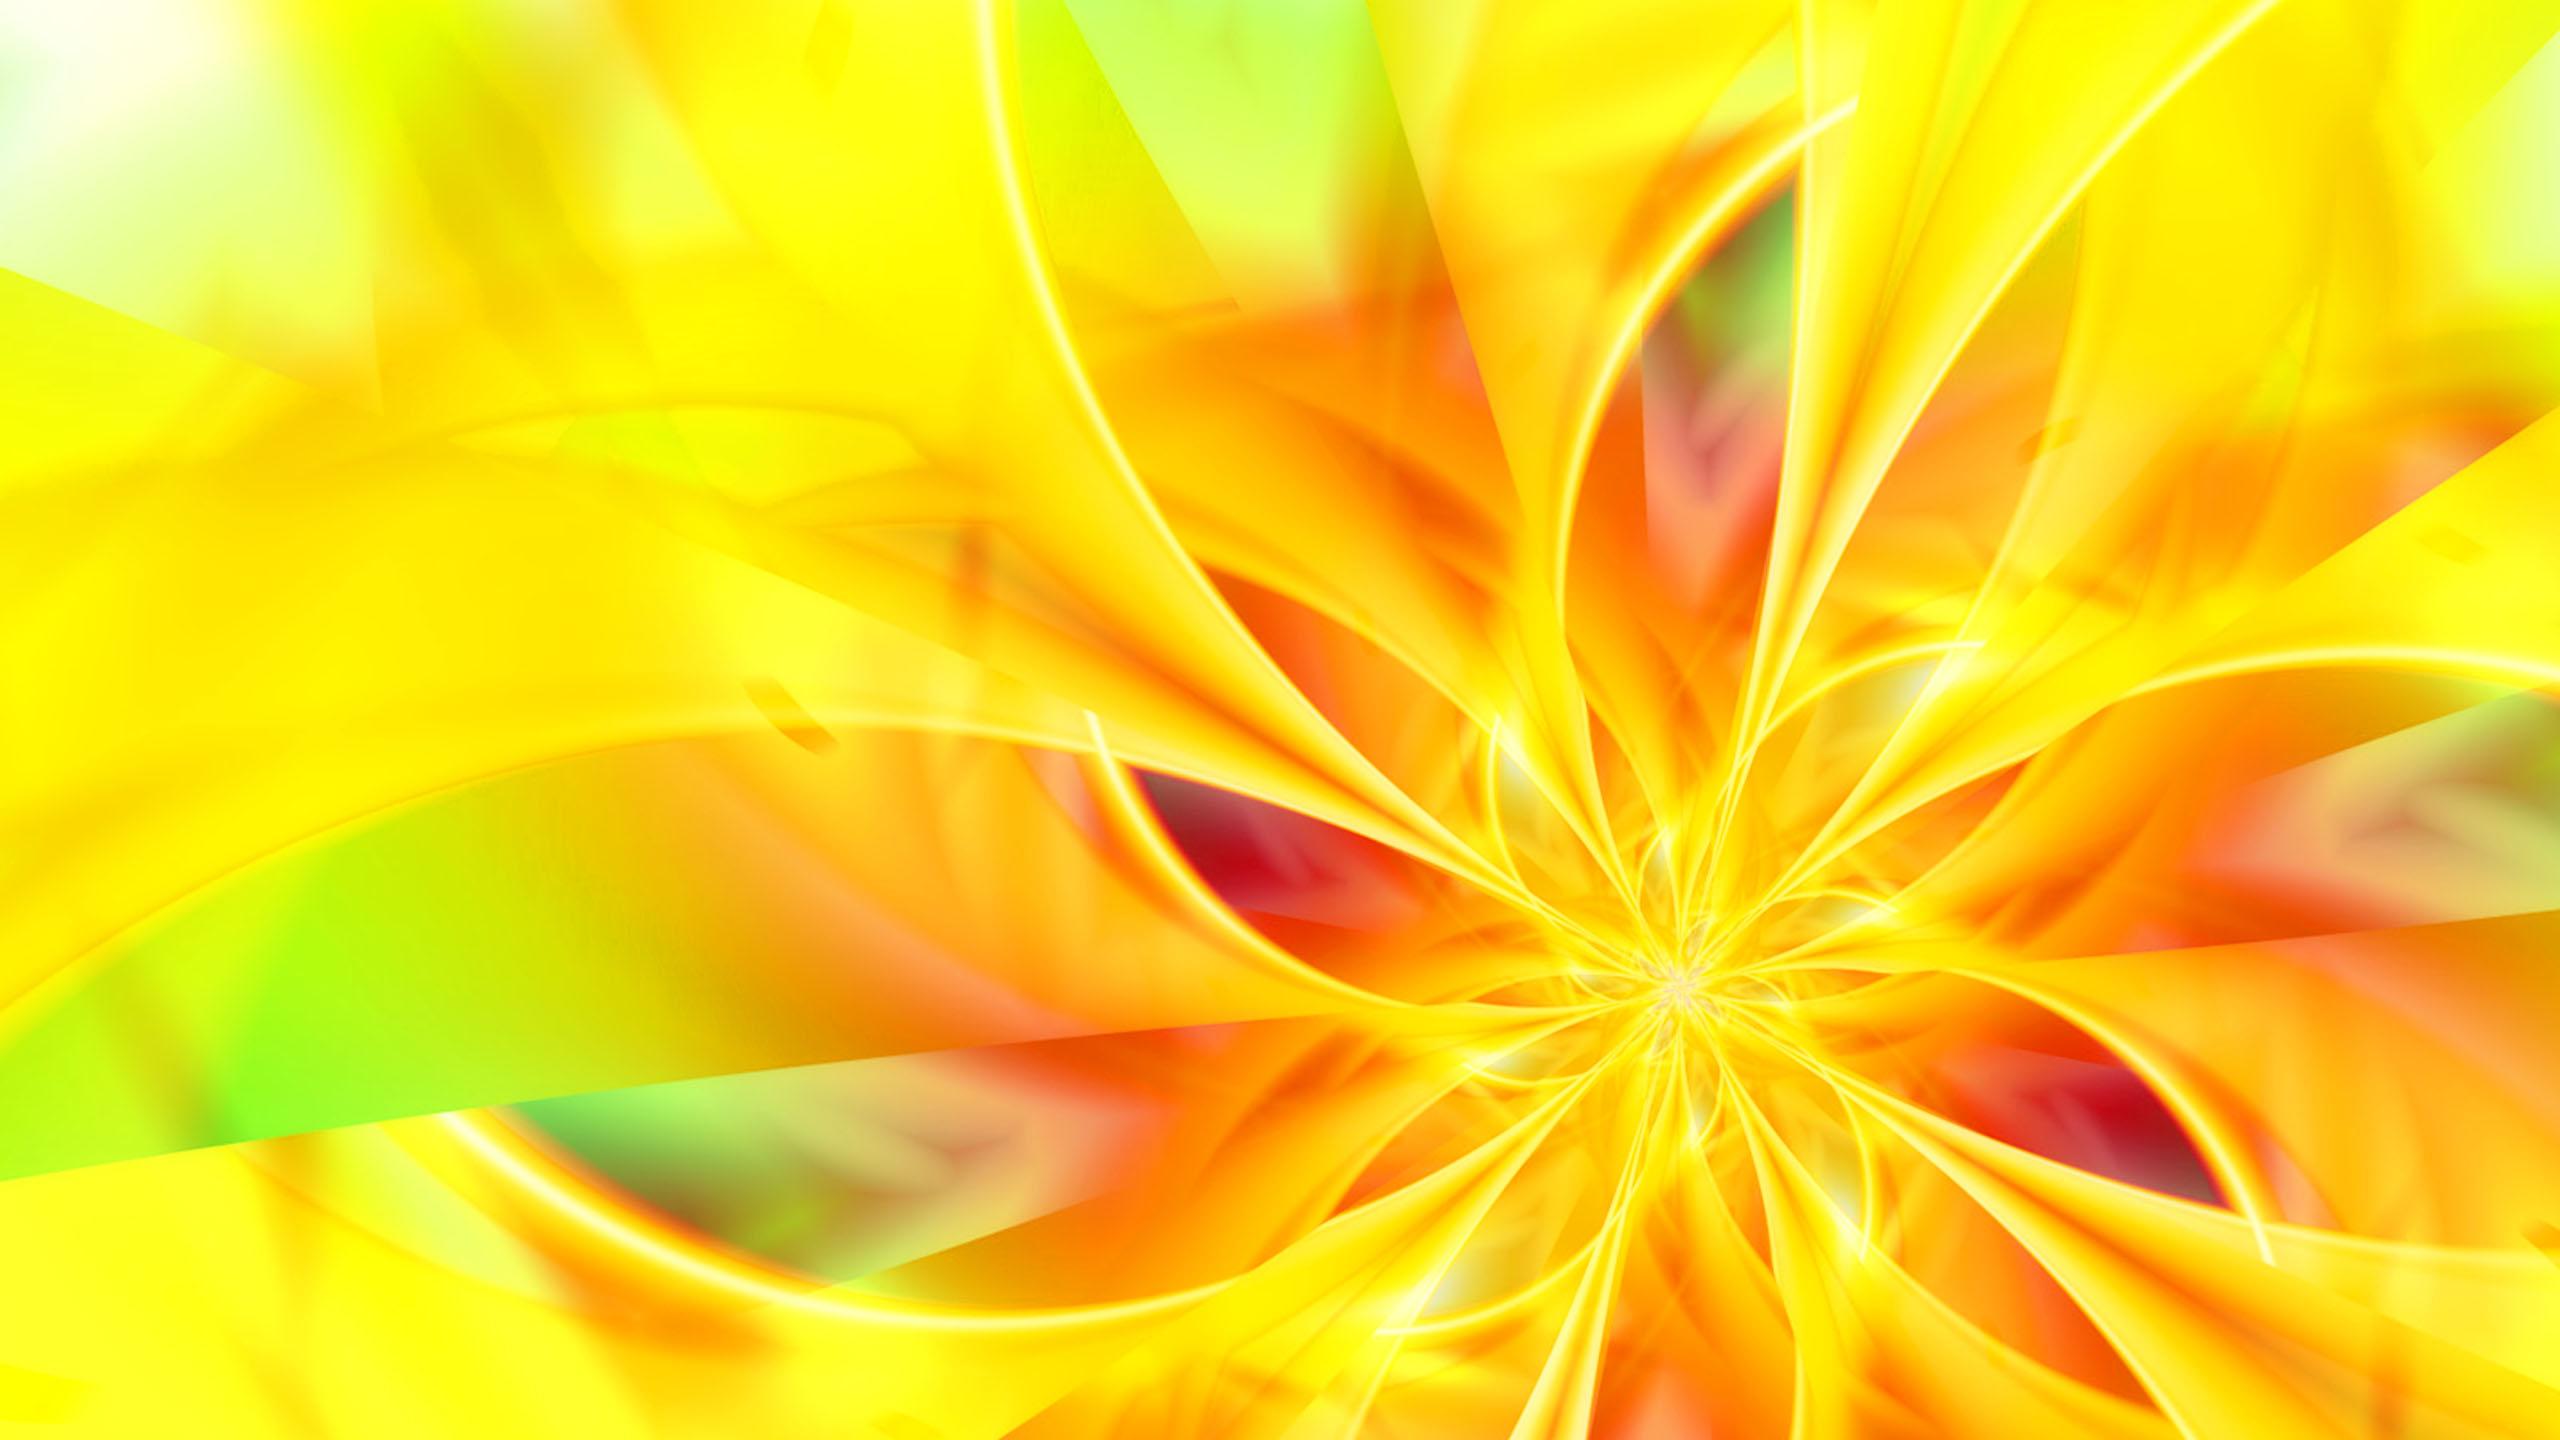 yellow-http-1080-net-yellow-html-wallpaper-wpc58010498